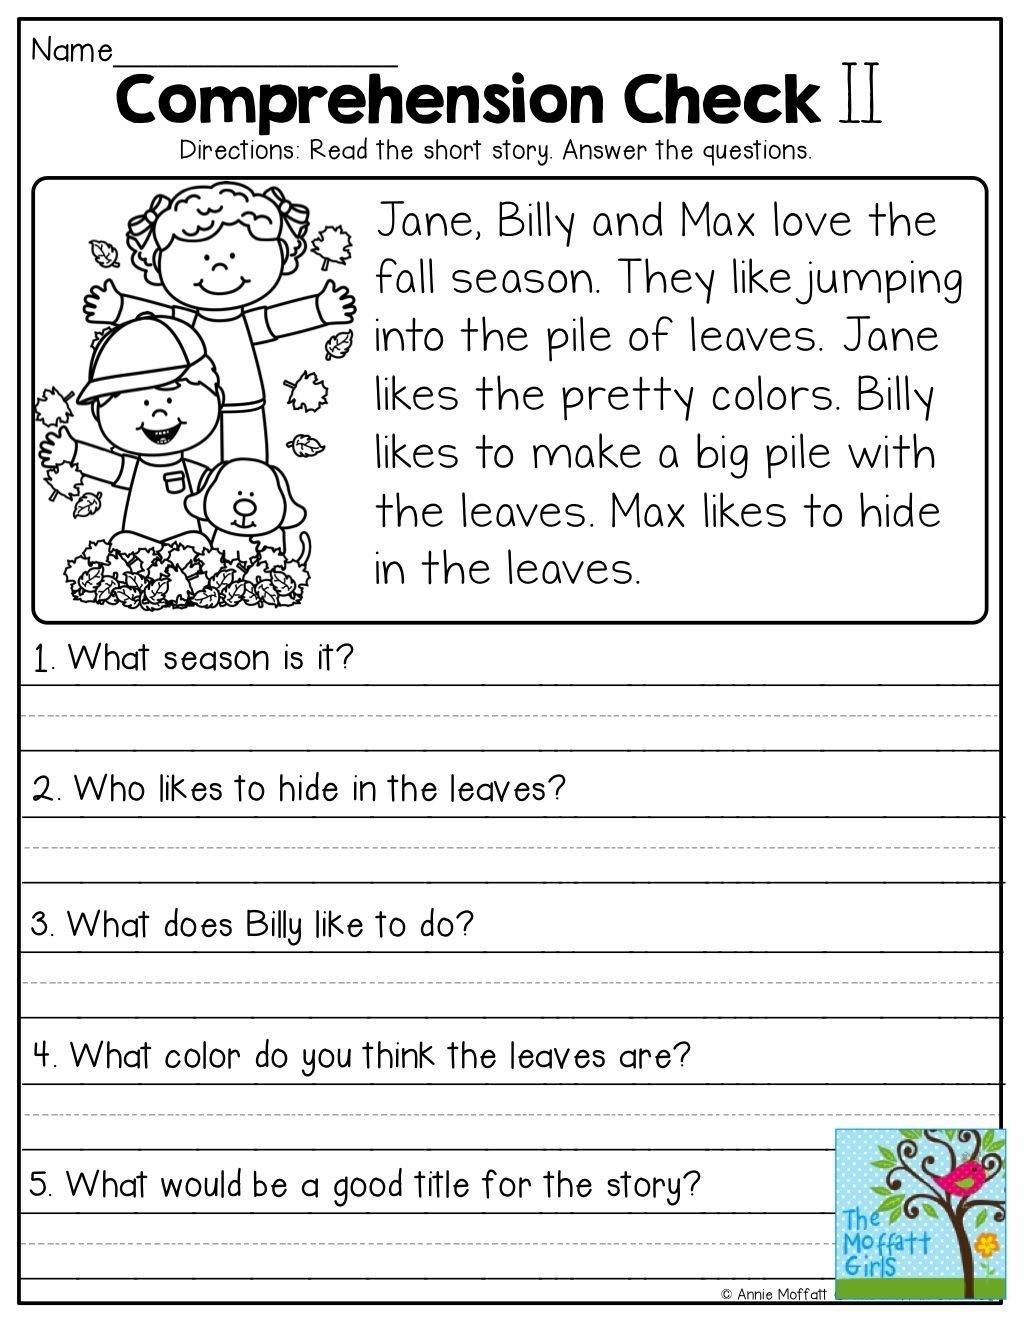 elegant reading comprehension main idea worksheets  elegant reading comprehension main idea worksheets kindergarten reading  comprehension passages main idea sequencing